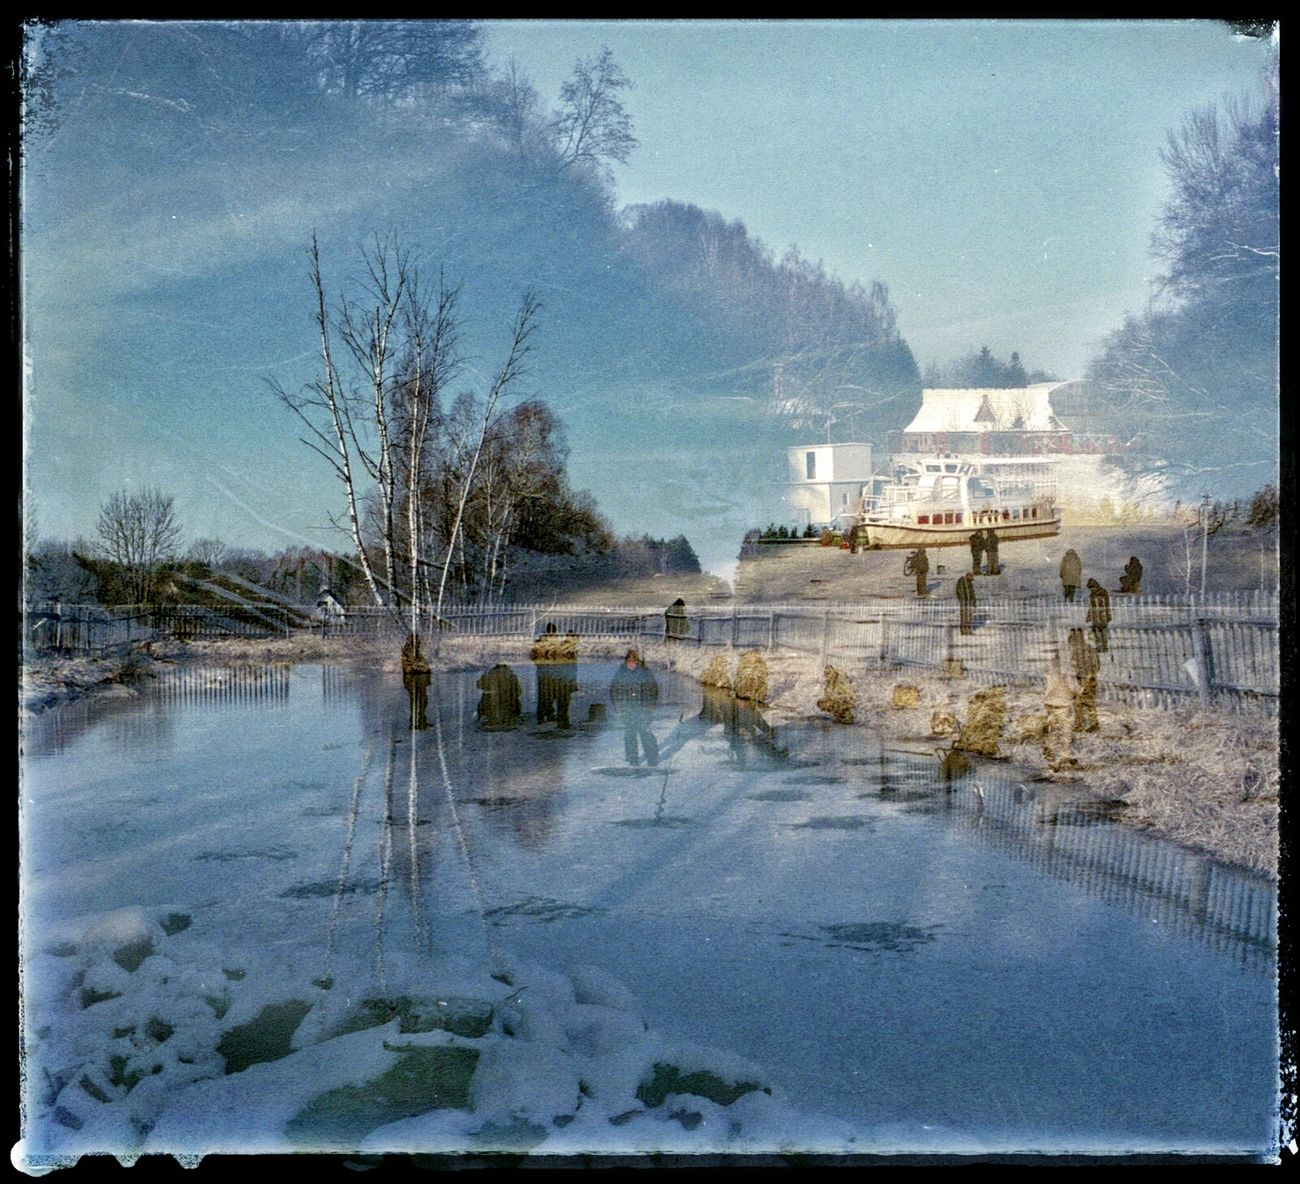 FilmSwap: Photographing the Elves II Film Swap Analogue Photography Elves Winter Lithuania Surreal Multiexposure  Double Exposure